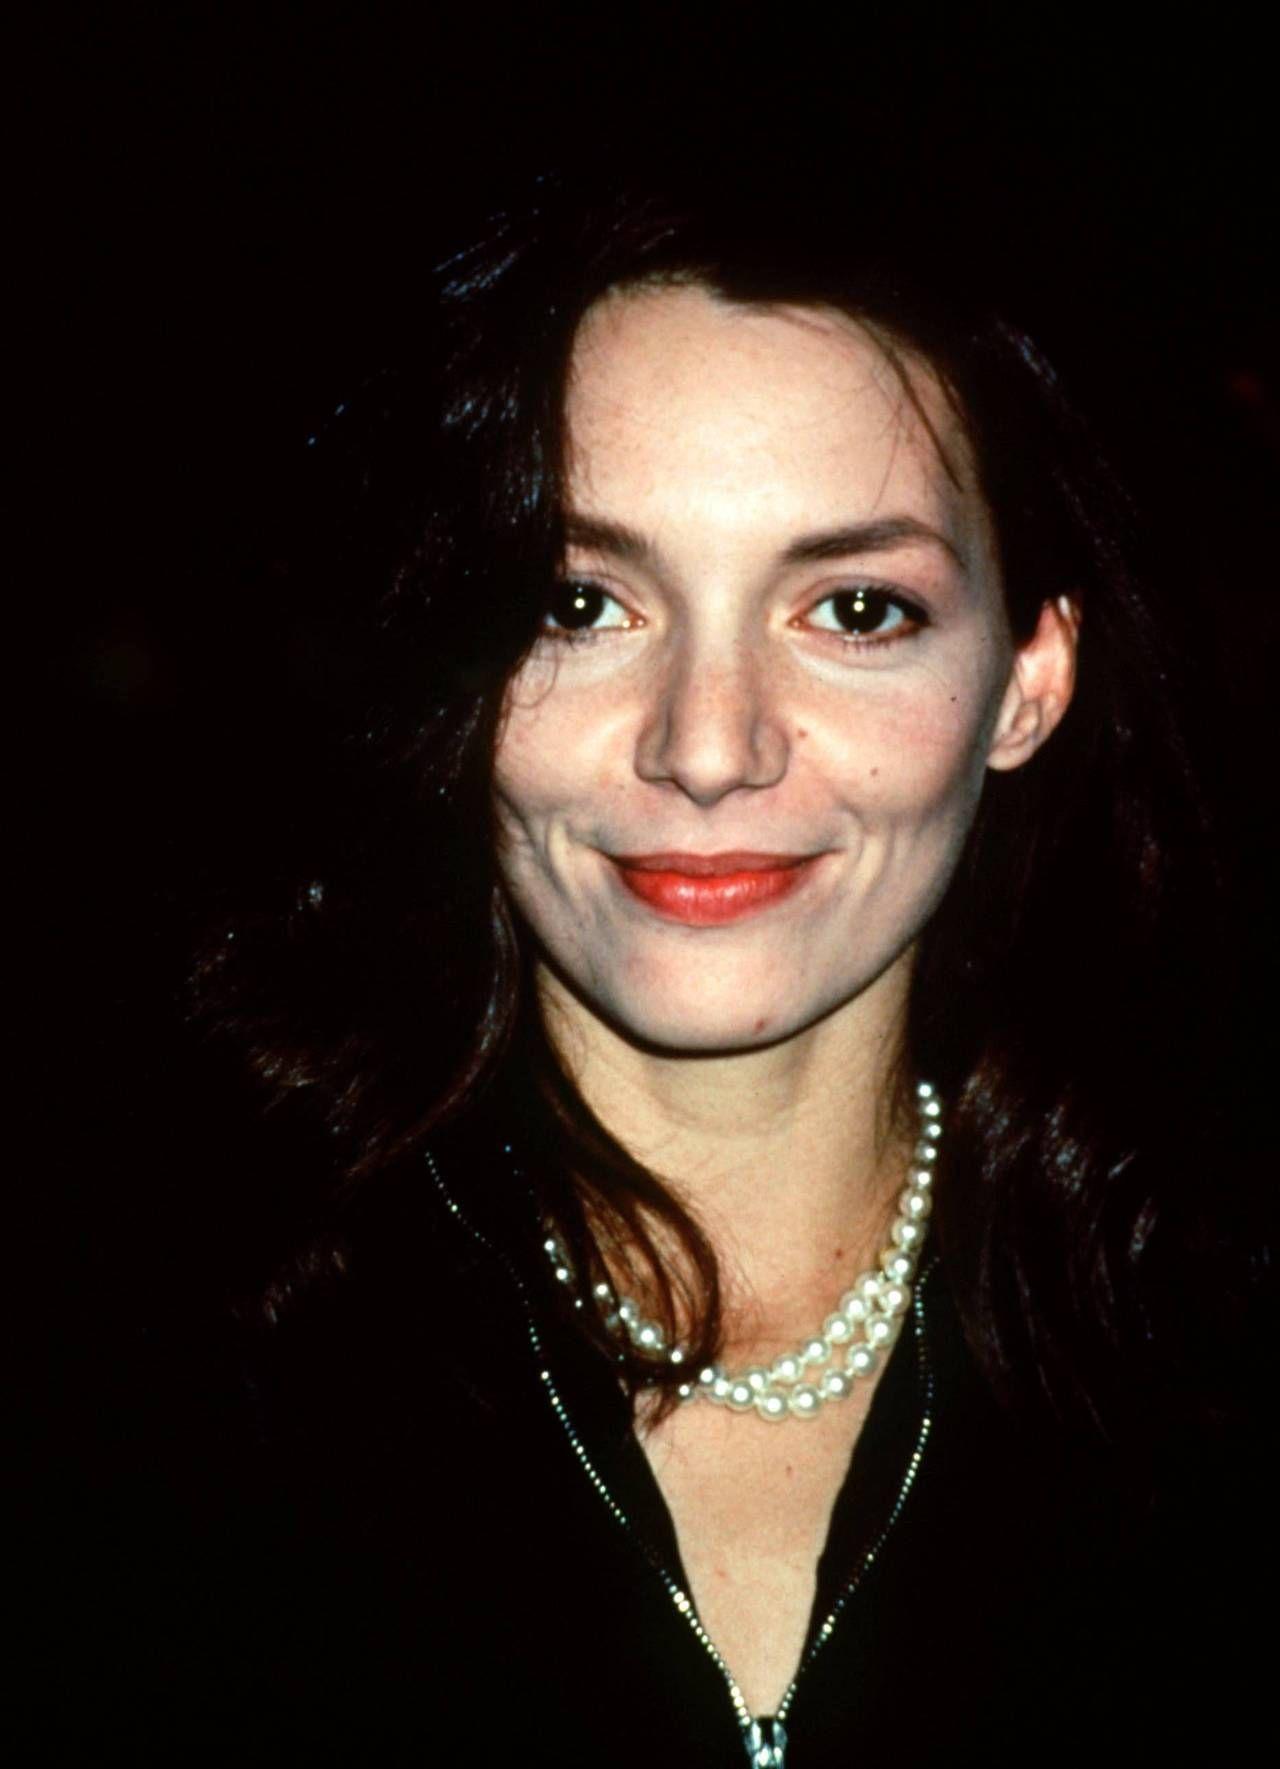 Joanne Whalley (born 1964)